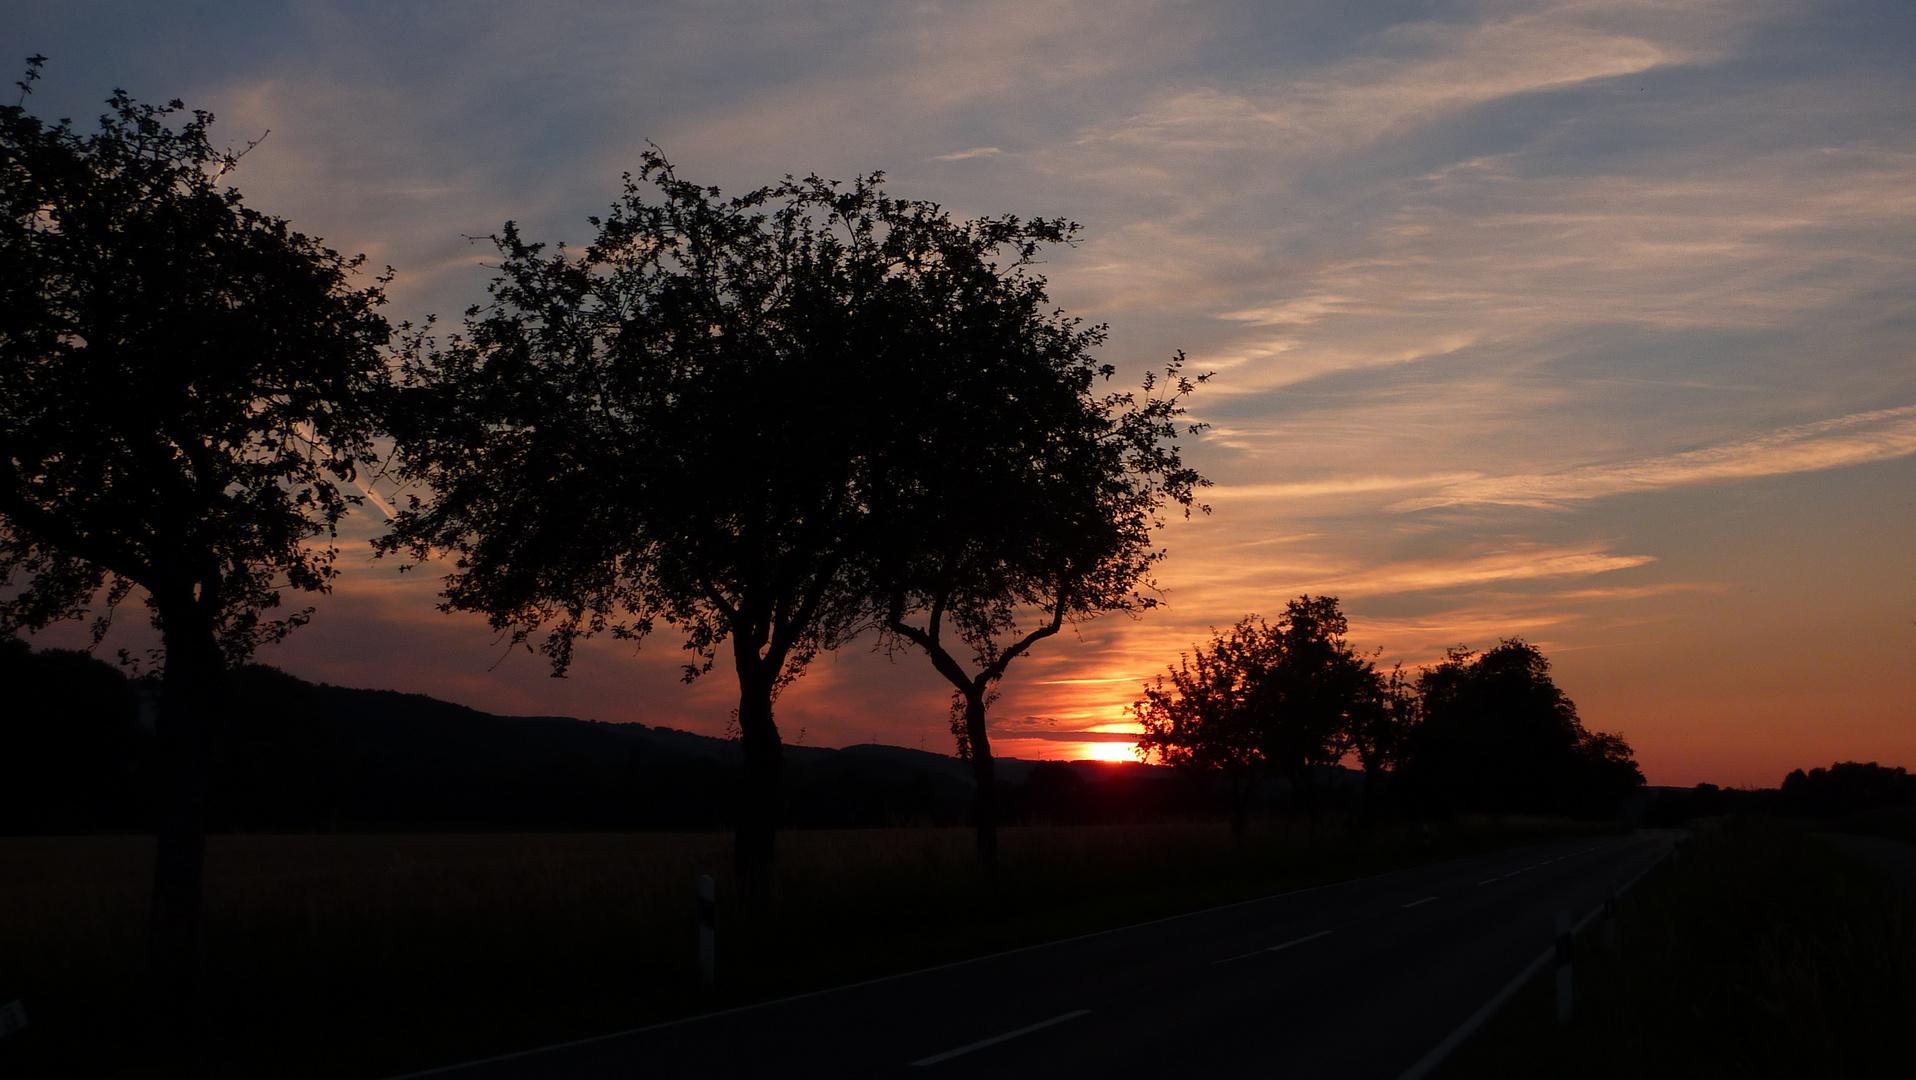 Sonnenuntergang im Juni 2014